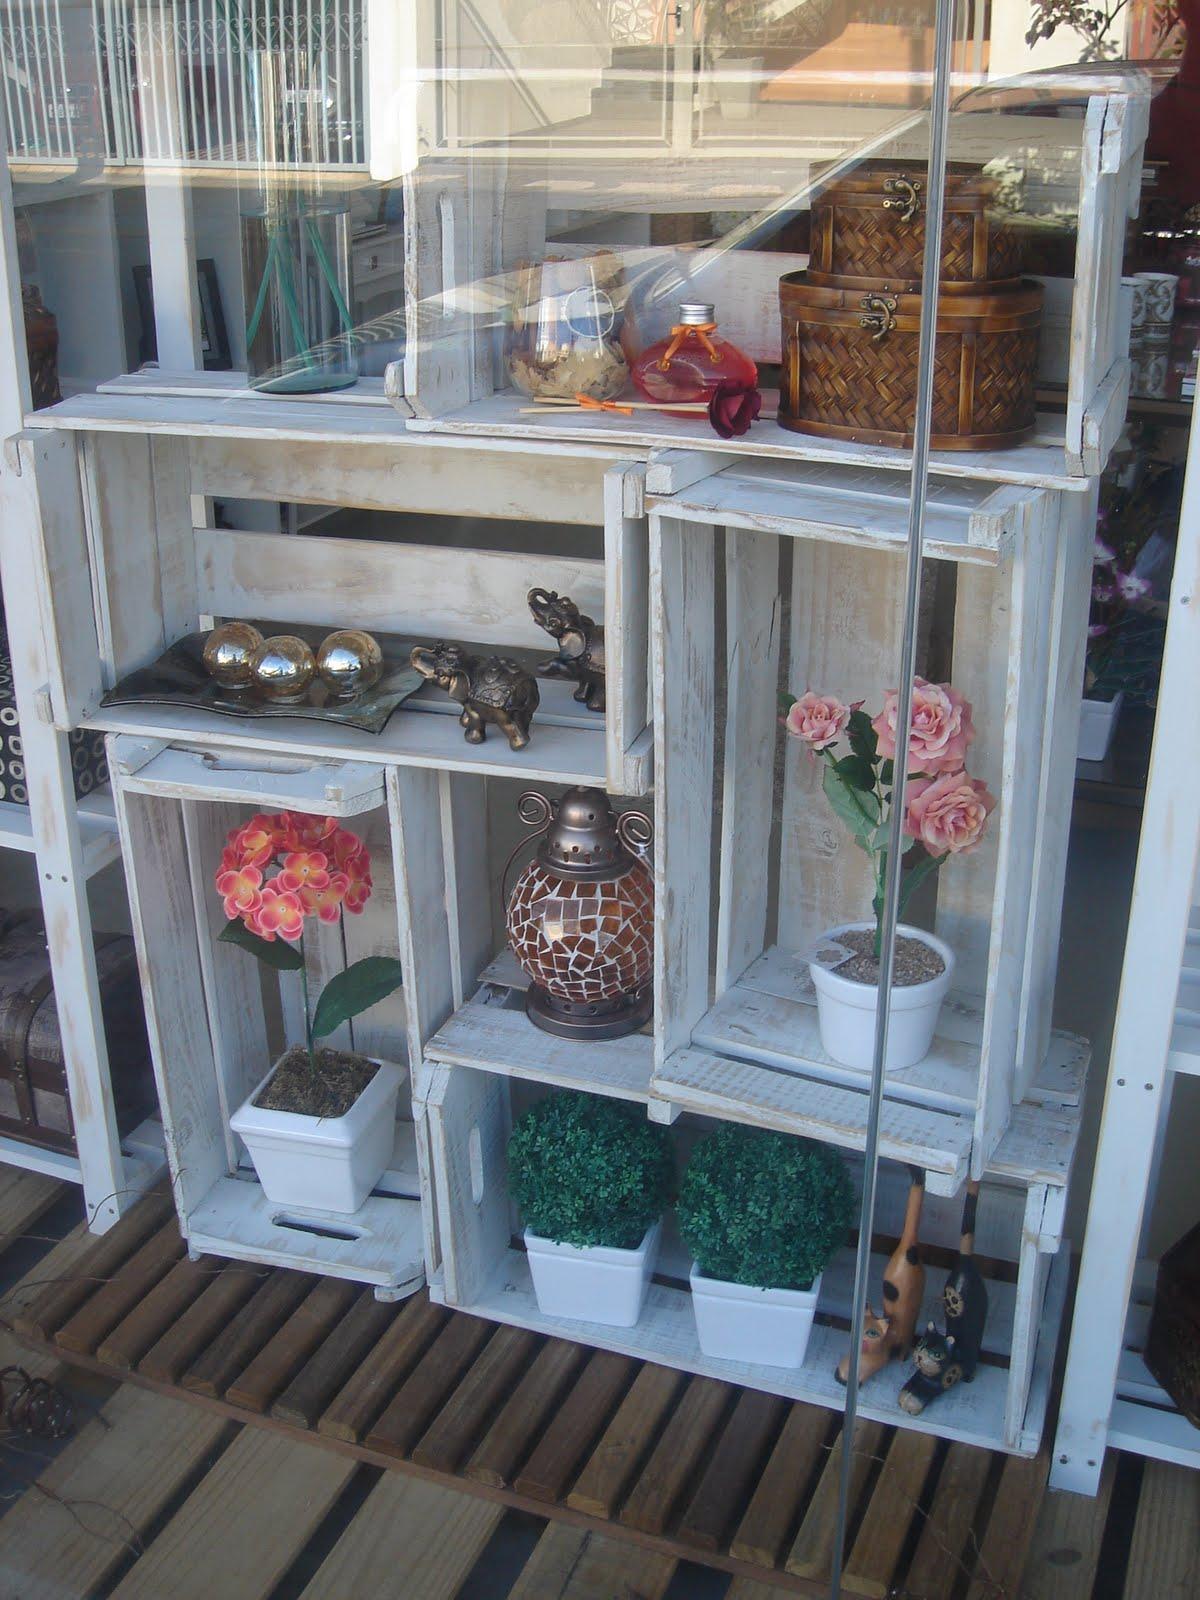 Arquiteta Thati Struckel: Reciclar e decorar caixotes de feira #496682 1200x1600